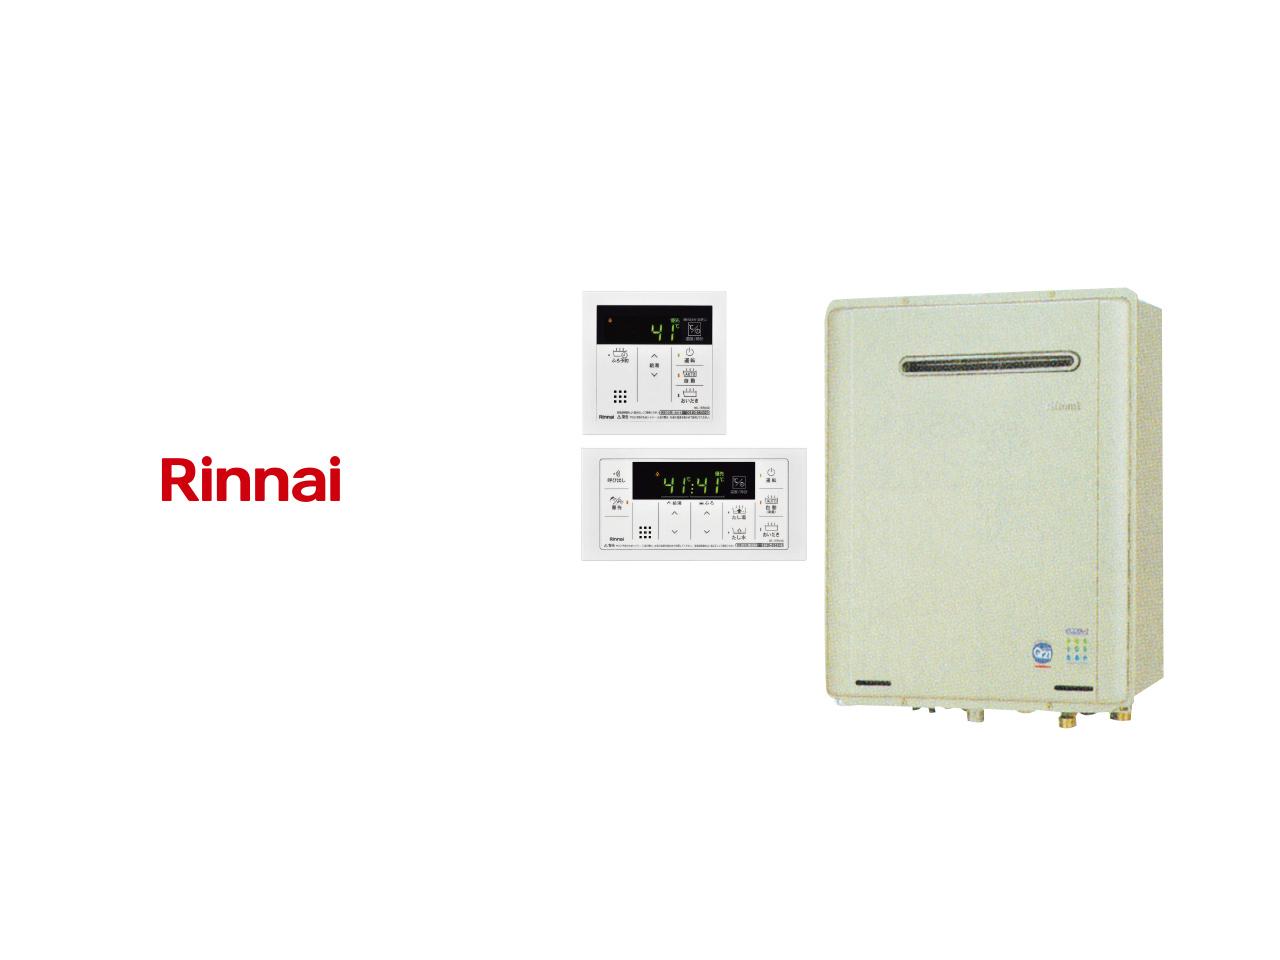 画像:【集合住宅用】高効率ふろ給湯器 Rinnai